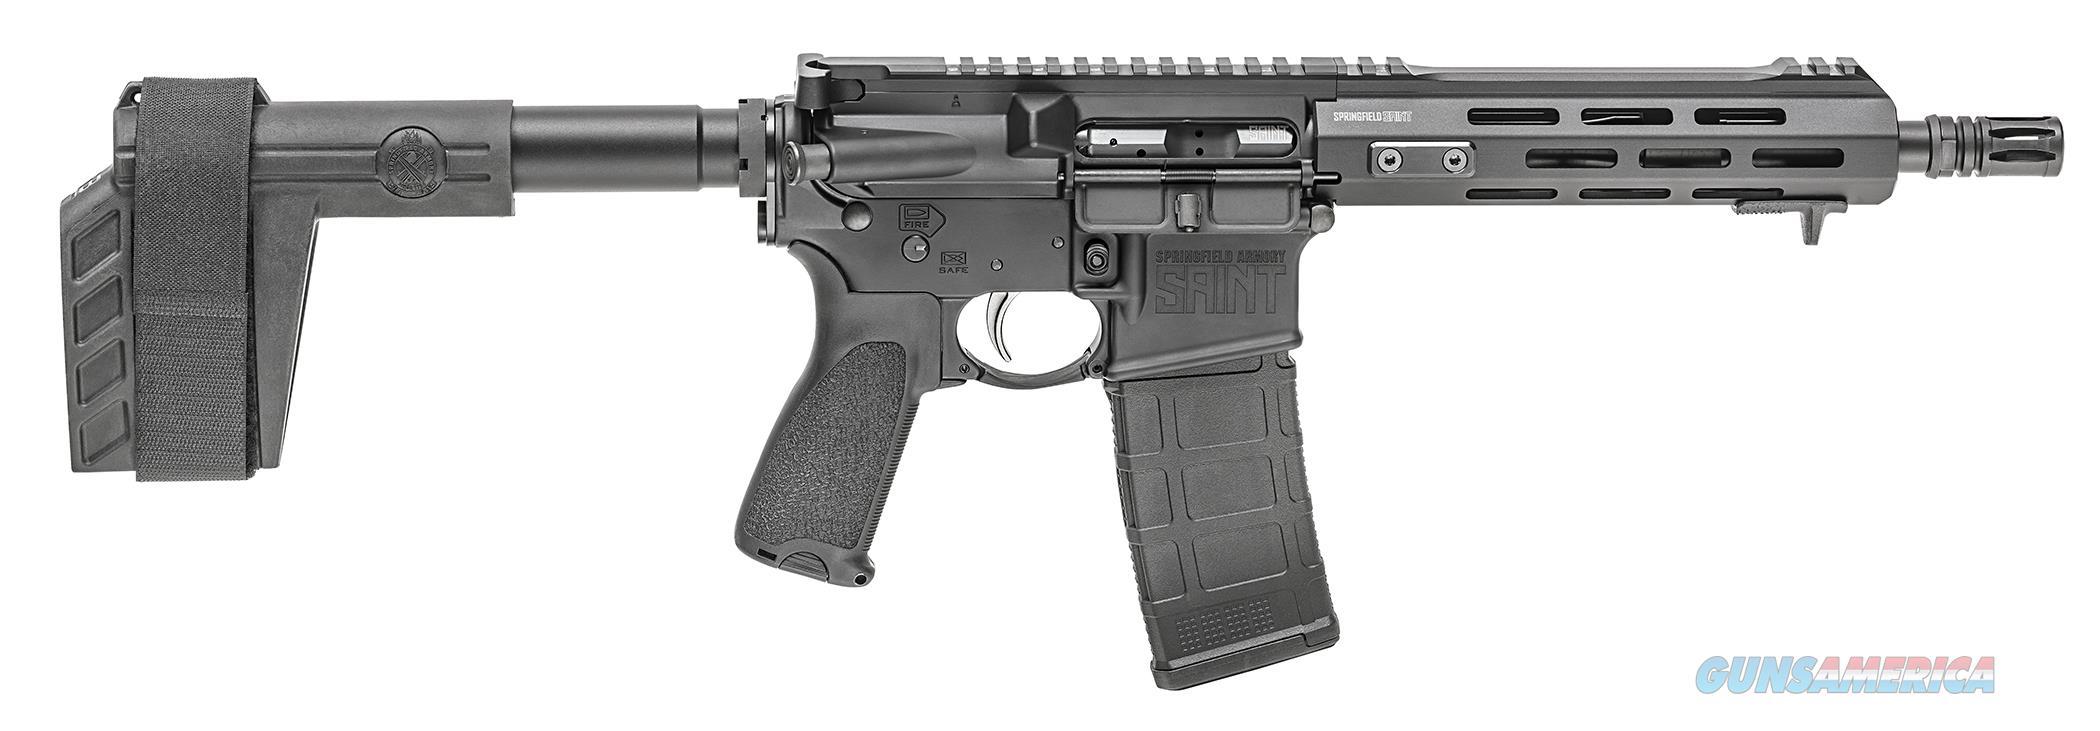 "Springfield Saint AR-15 Pistol .300 BLK 9"" 30 Rds ST909300B   Guns > Pistols > Springfield Armory Pistols > SAINT Pistol"